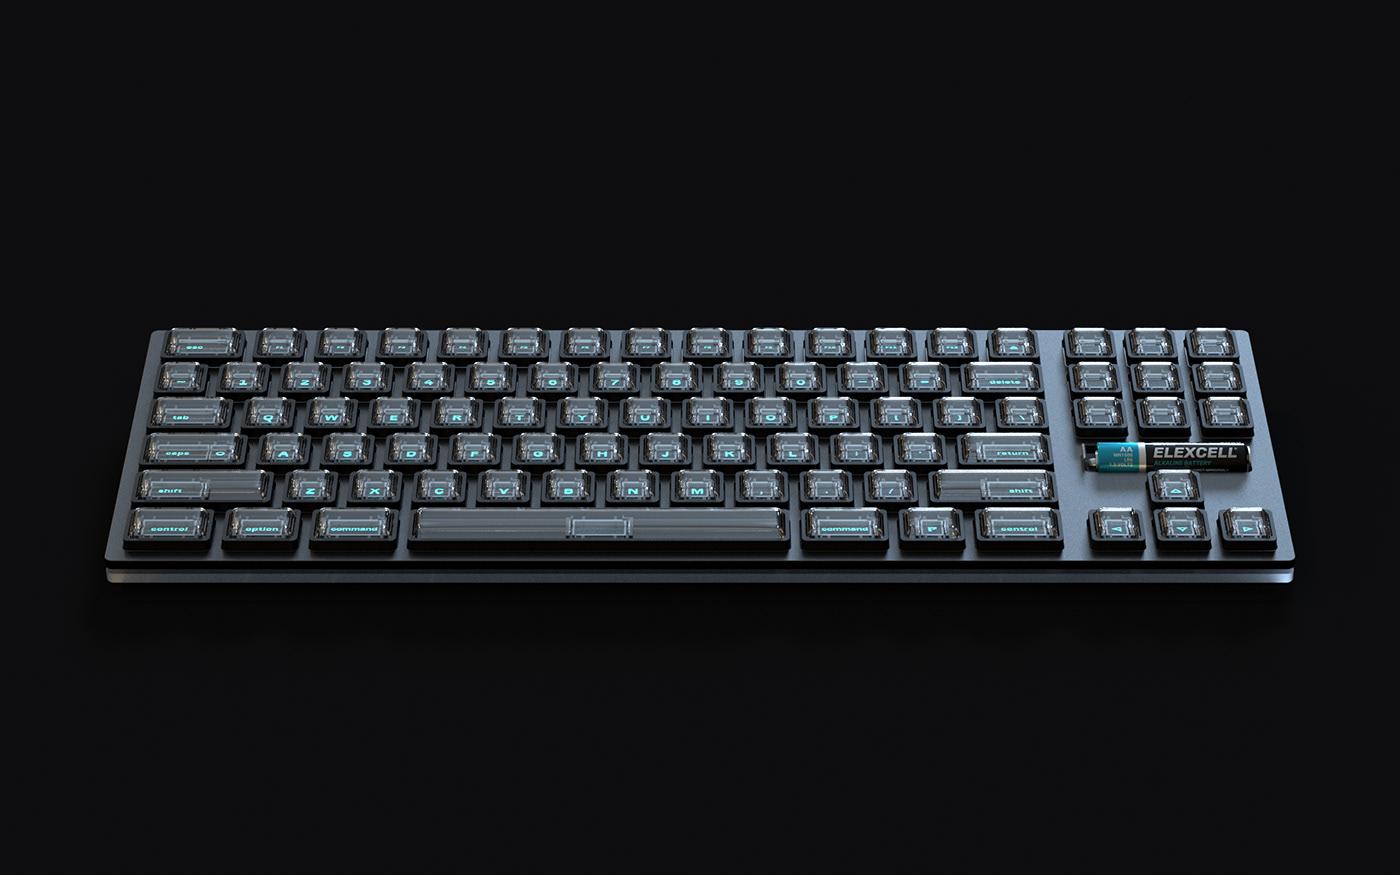 VFD Keyboard by Richard Falcema